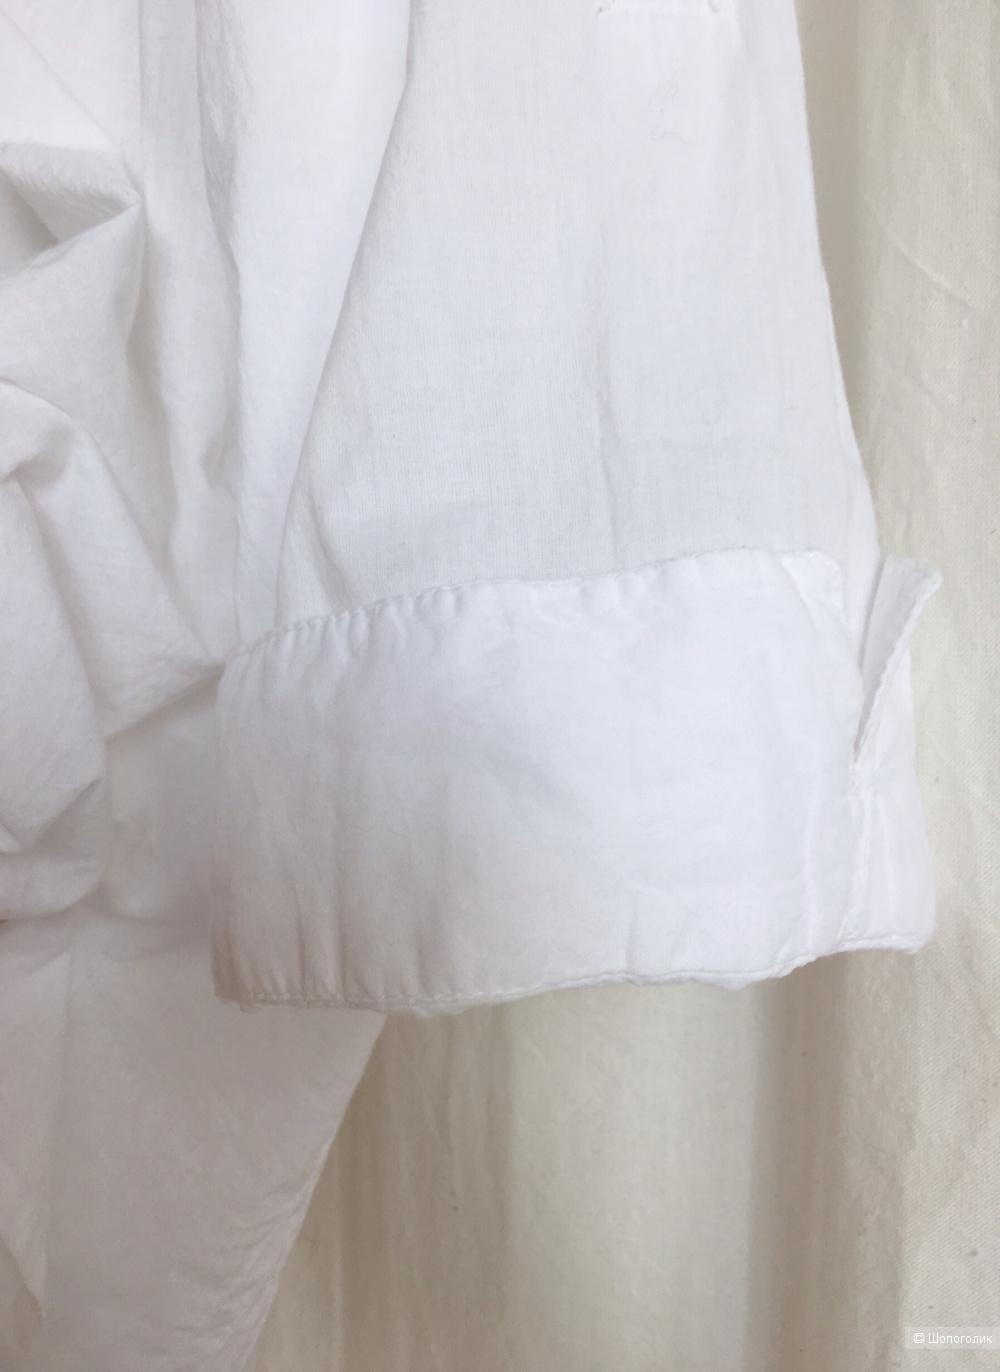 Рубашка Maglierie di Perugia. Размер М.